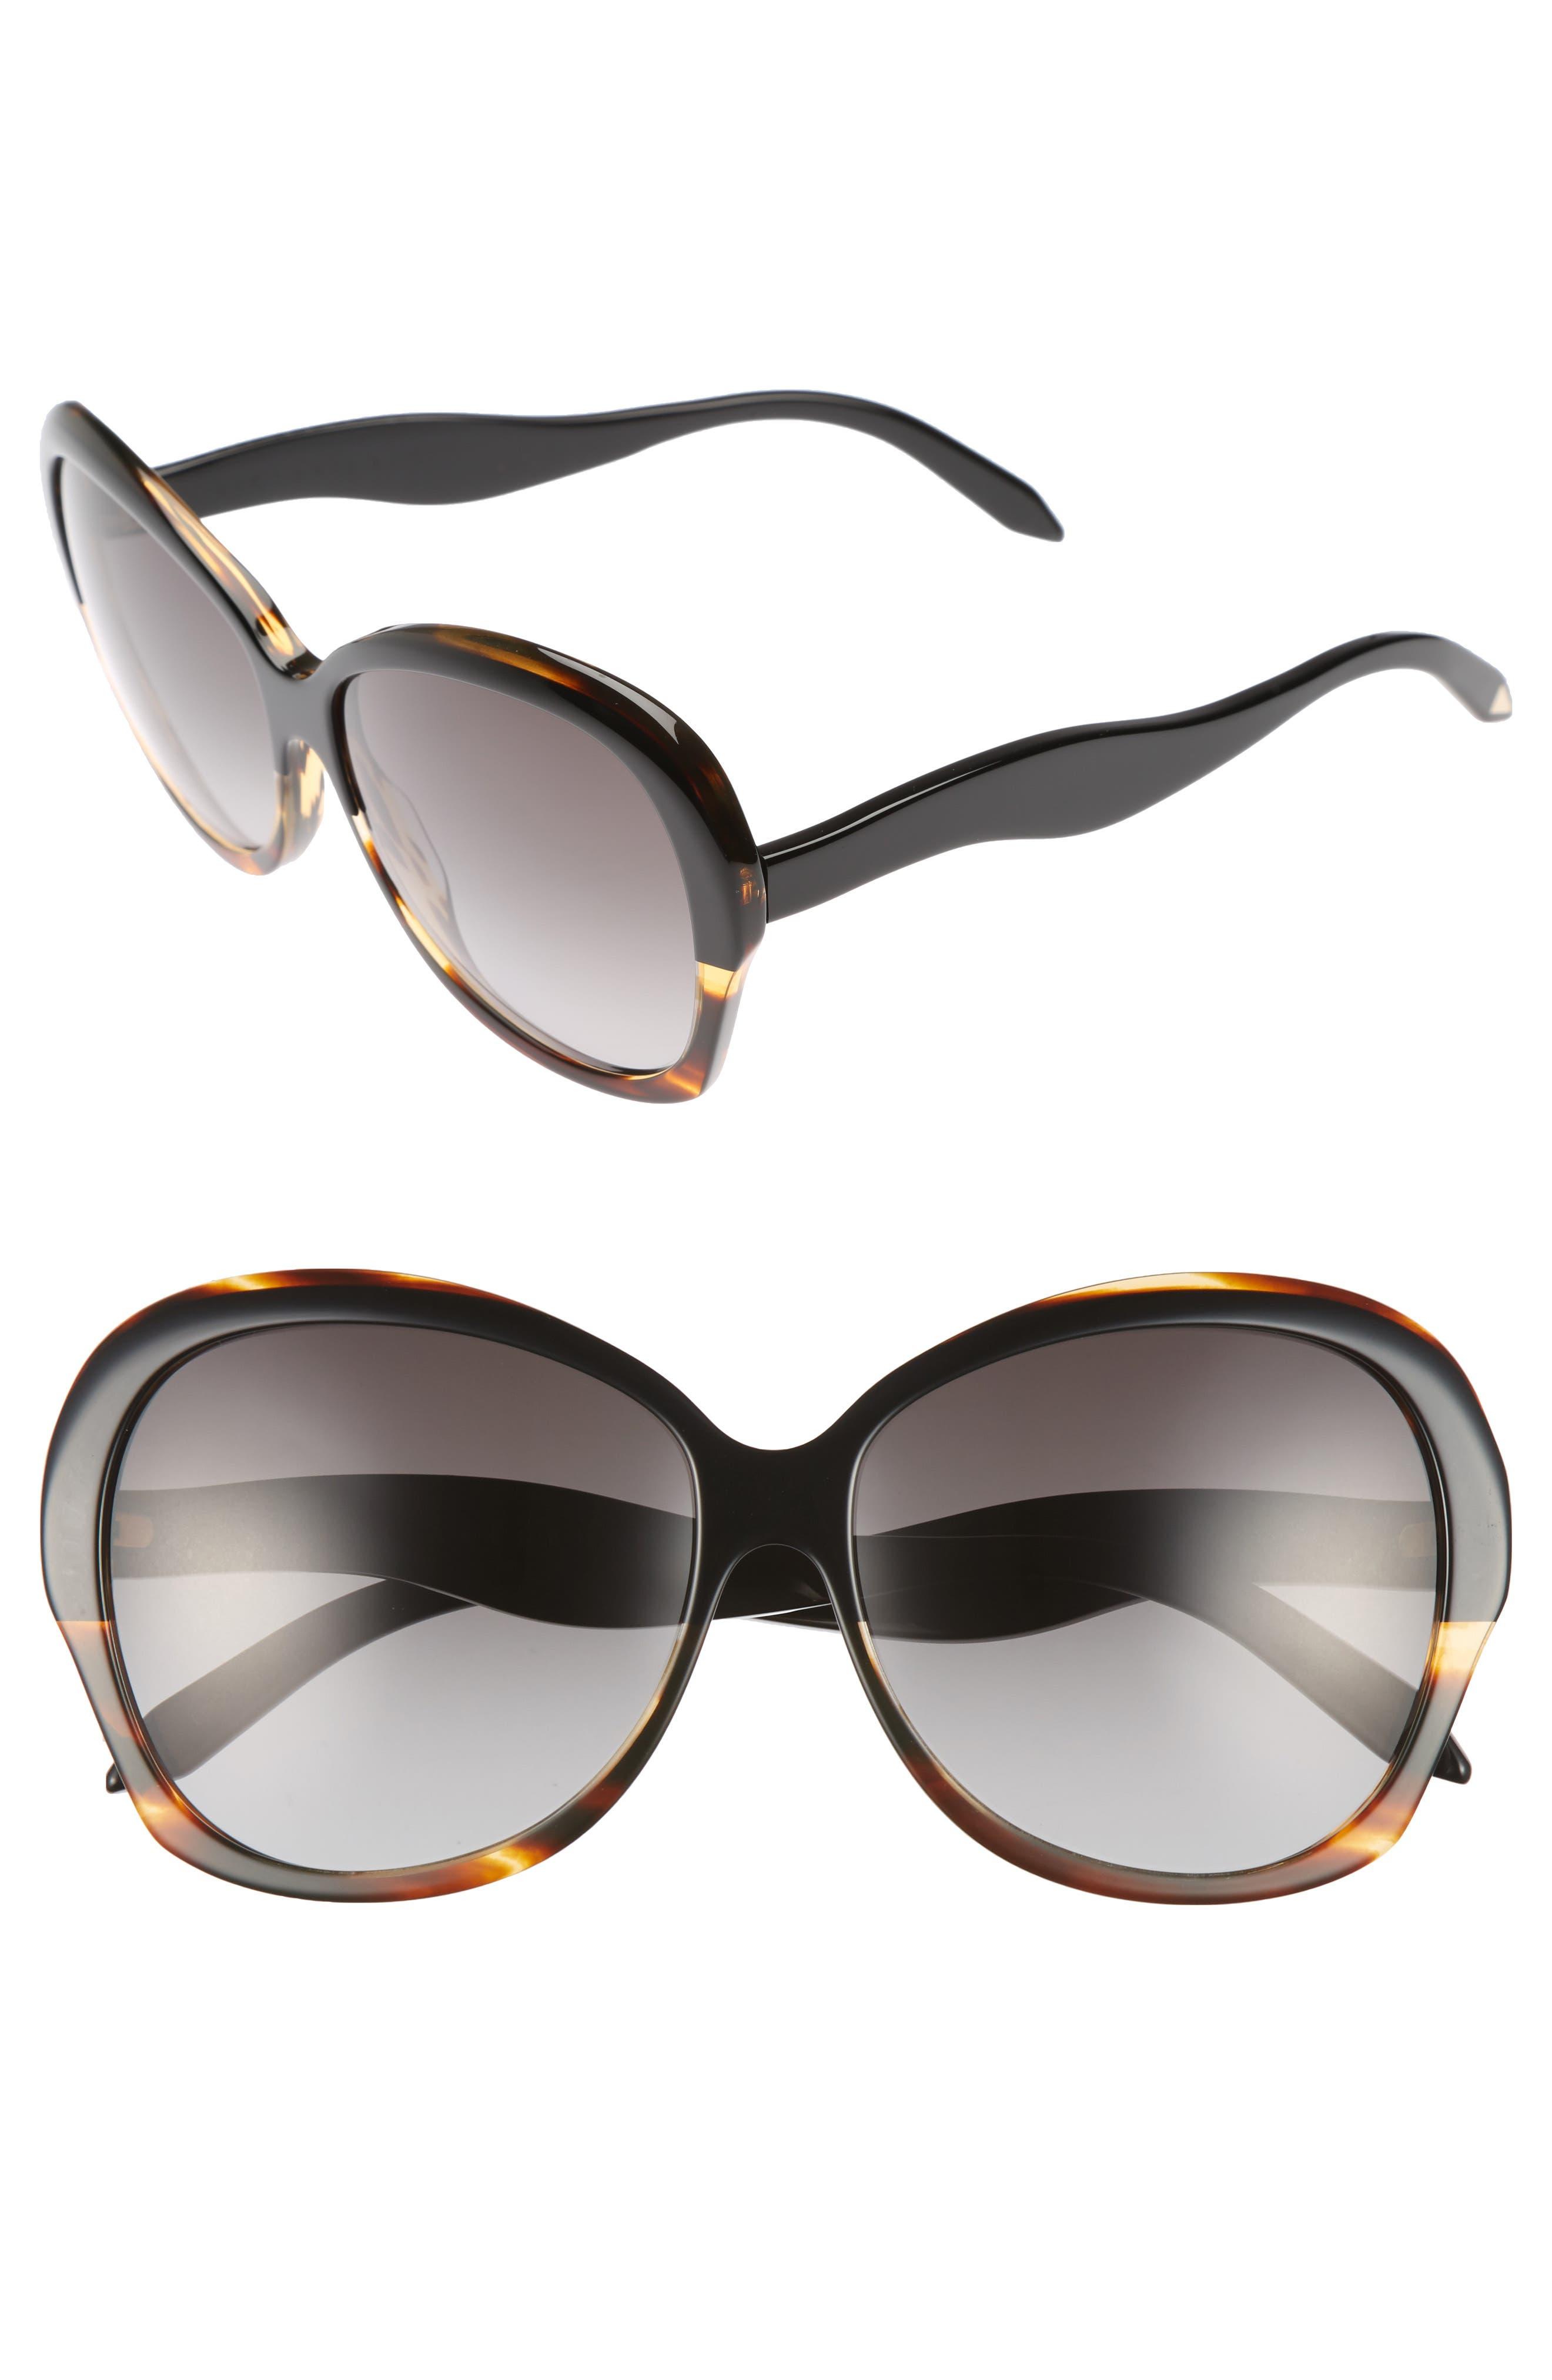 VICTORIA BECKHAM, Happy 60mm Butterfly Sunglasses, Main thumbnail 1, color, BLACK/ TORTOISE GRAD